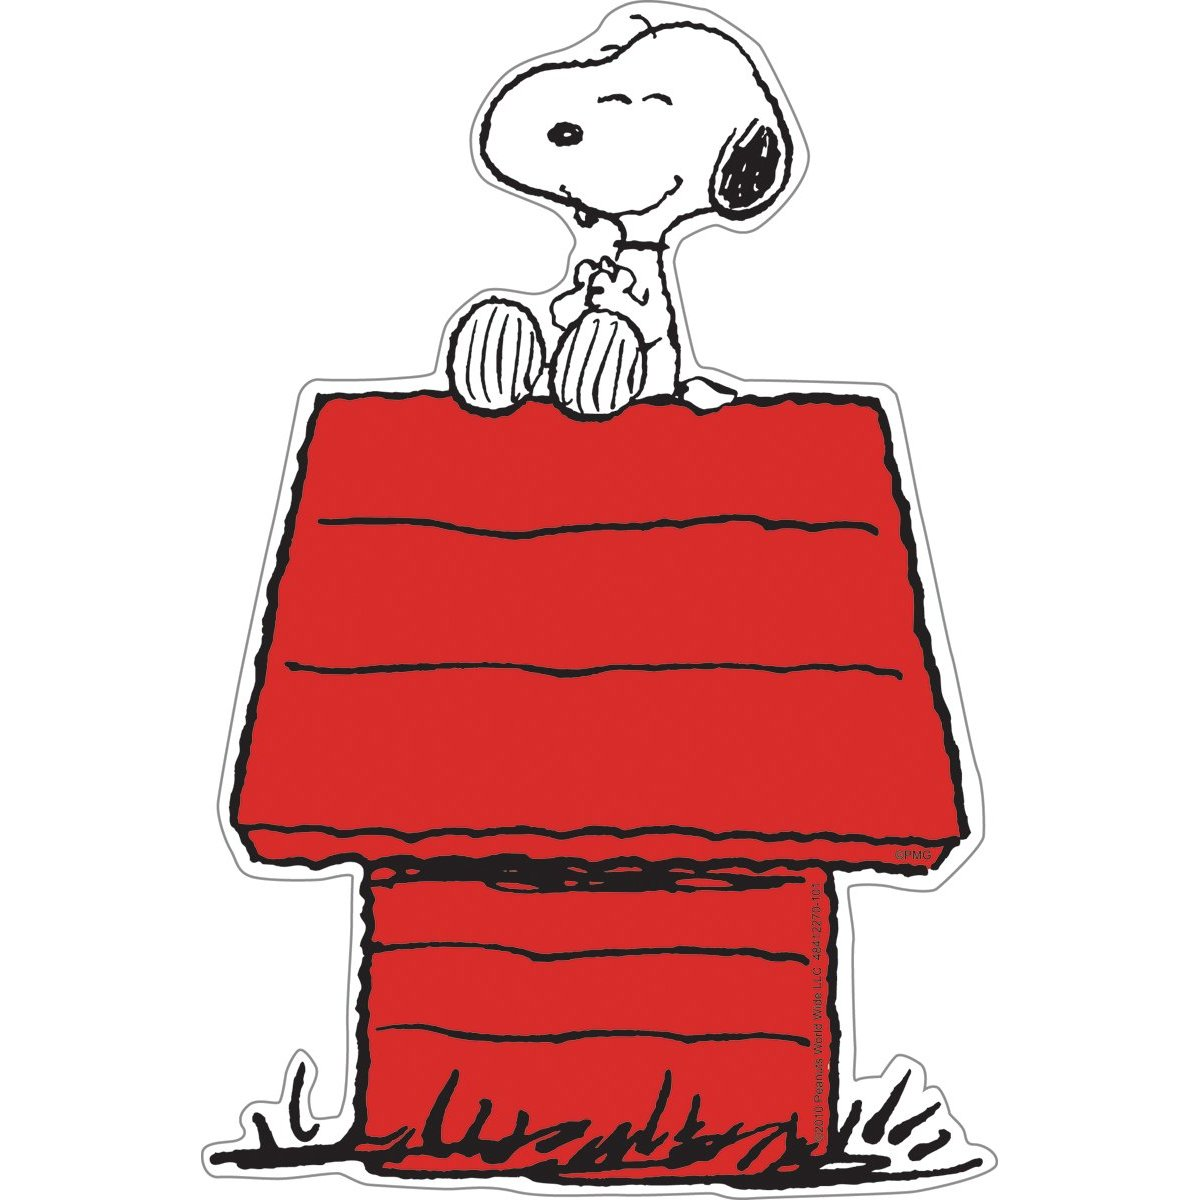 Snoopy - Snoopy Photo (33124905) - Fanpop